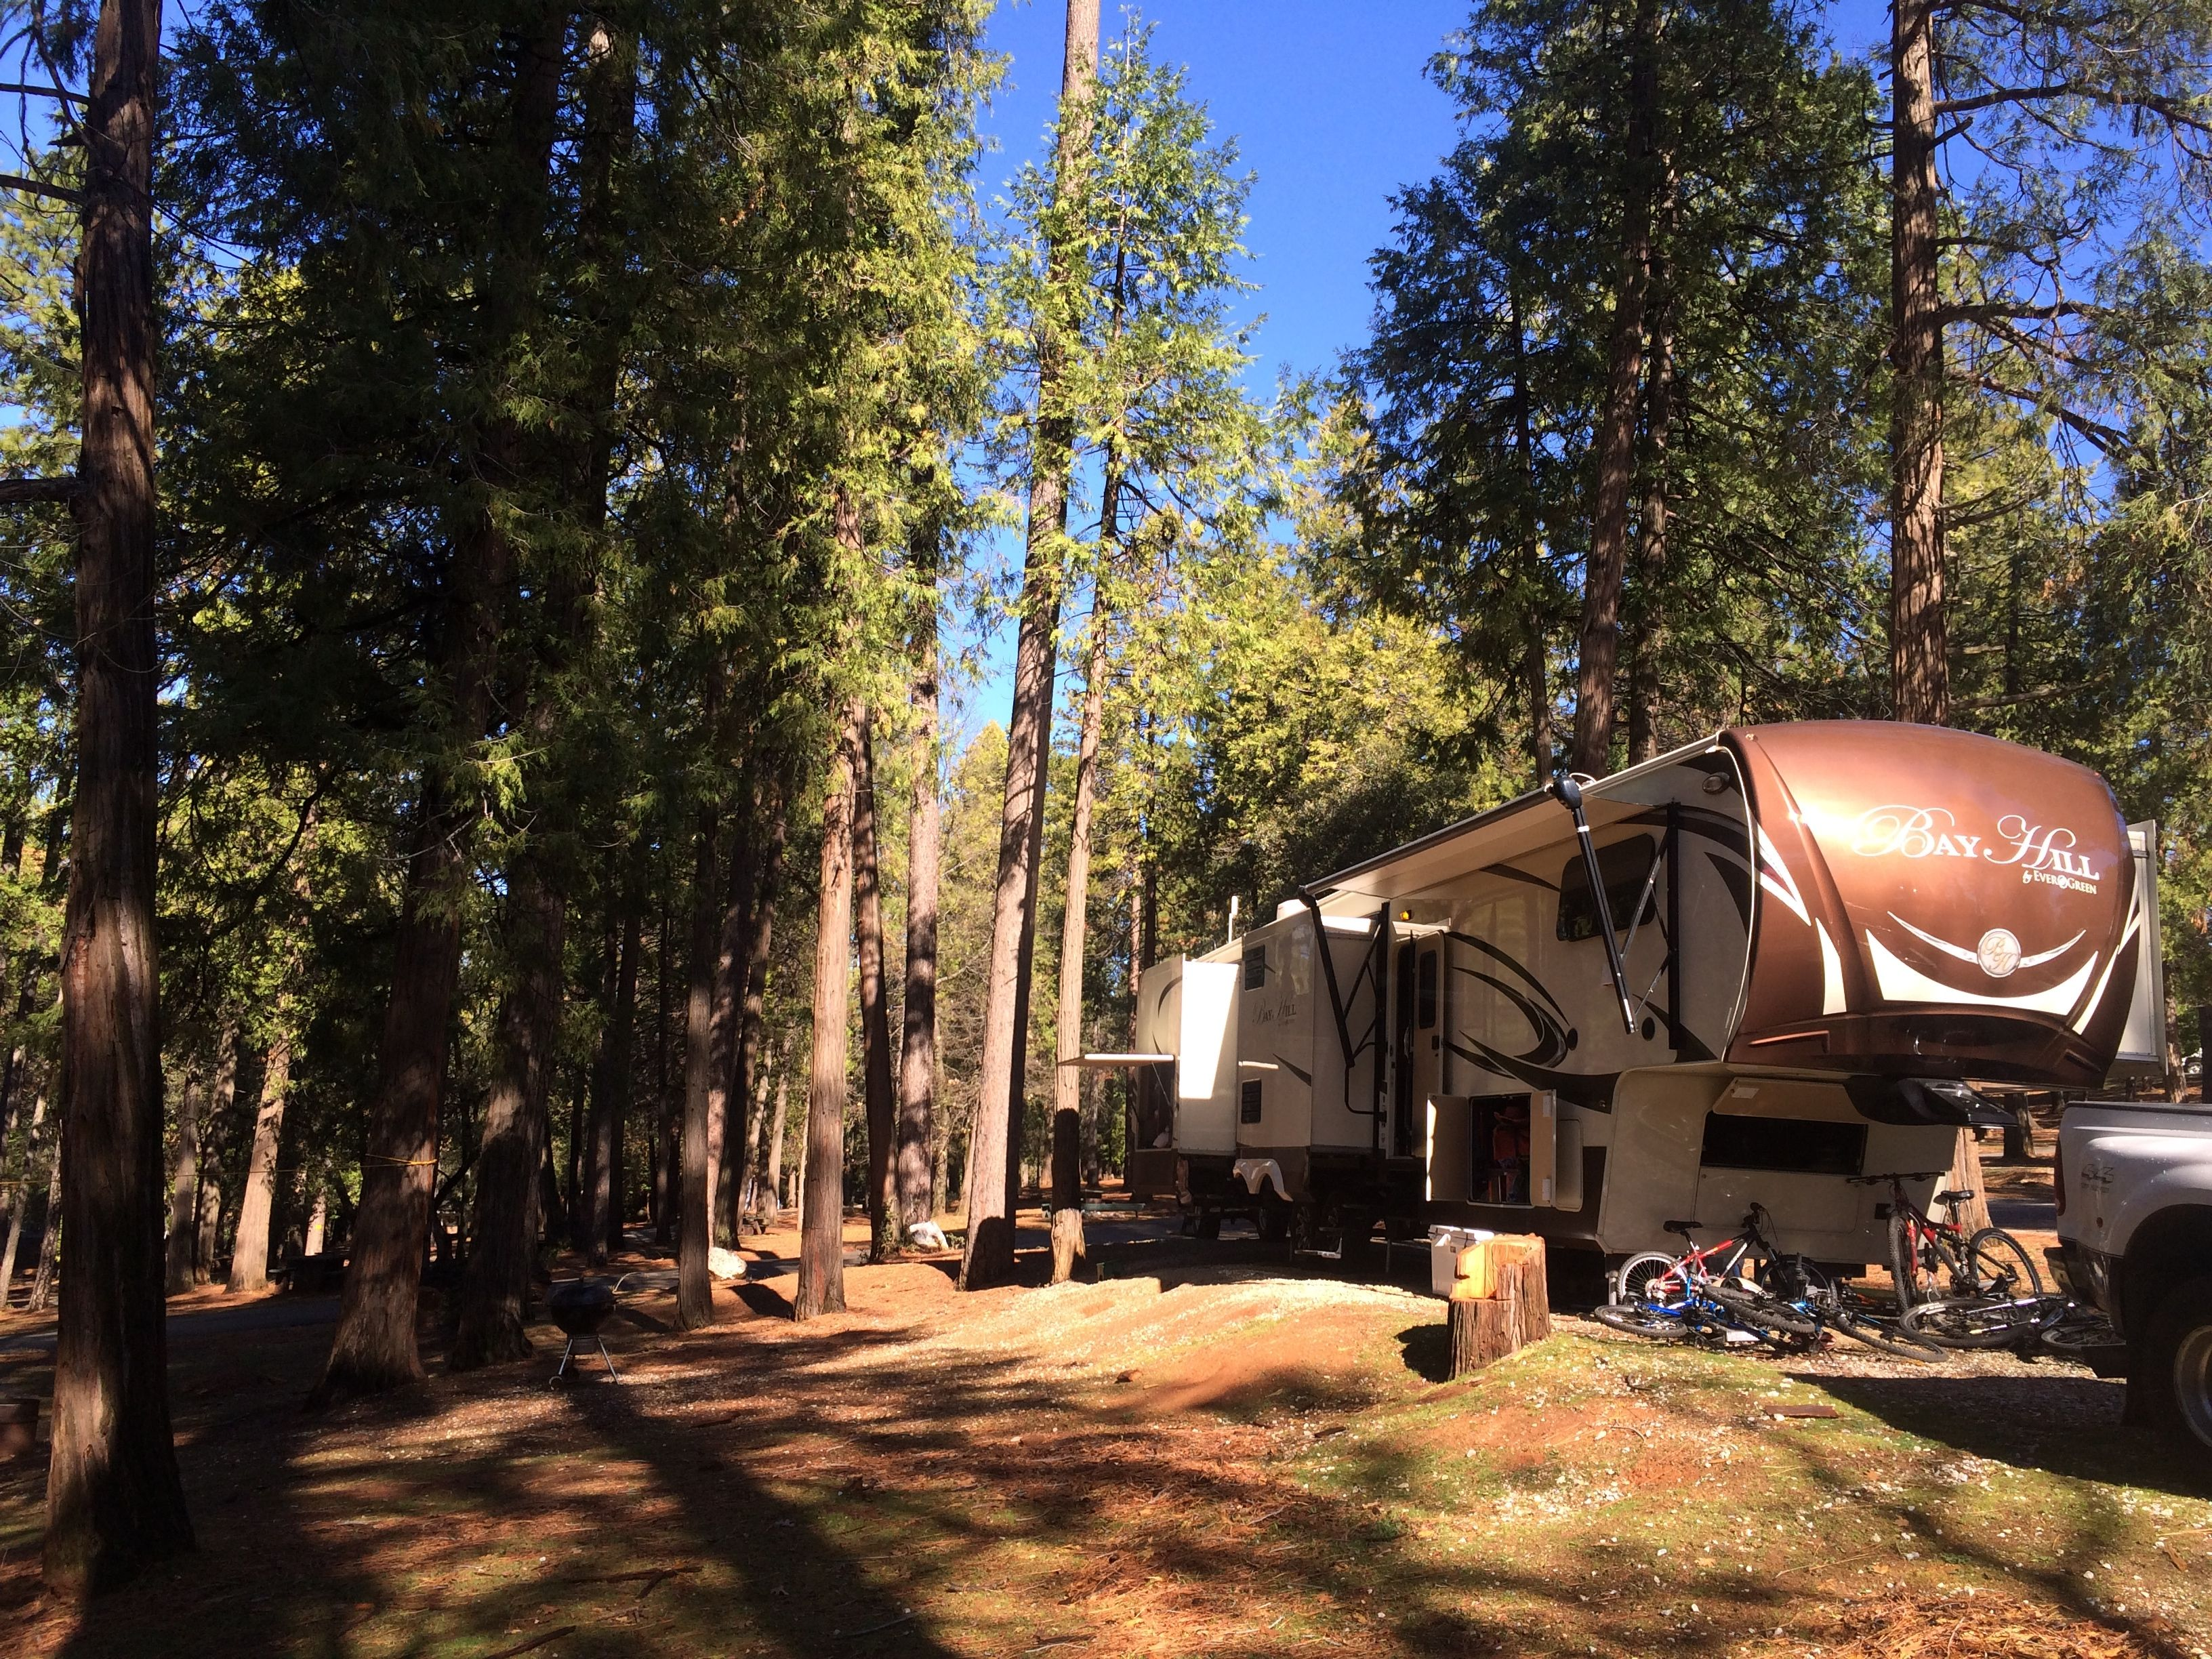 Our Campsite in Pine Grove, CA